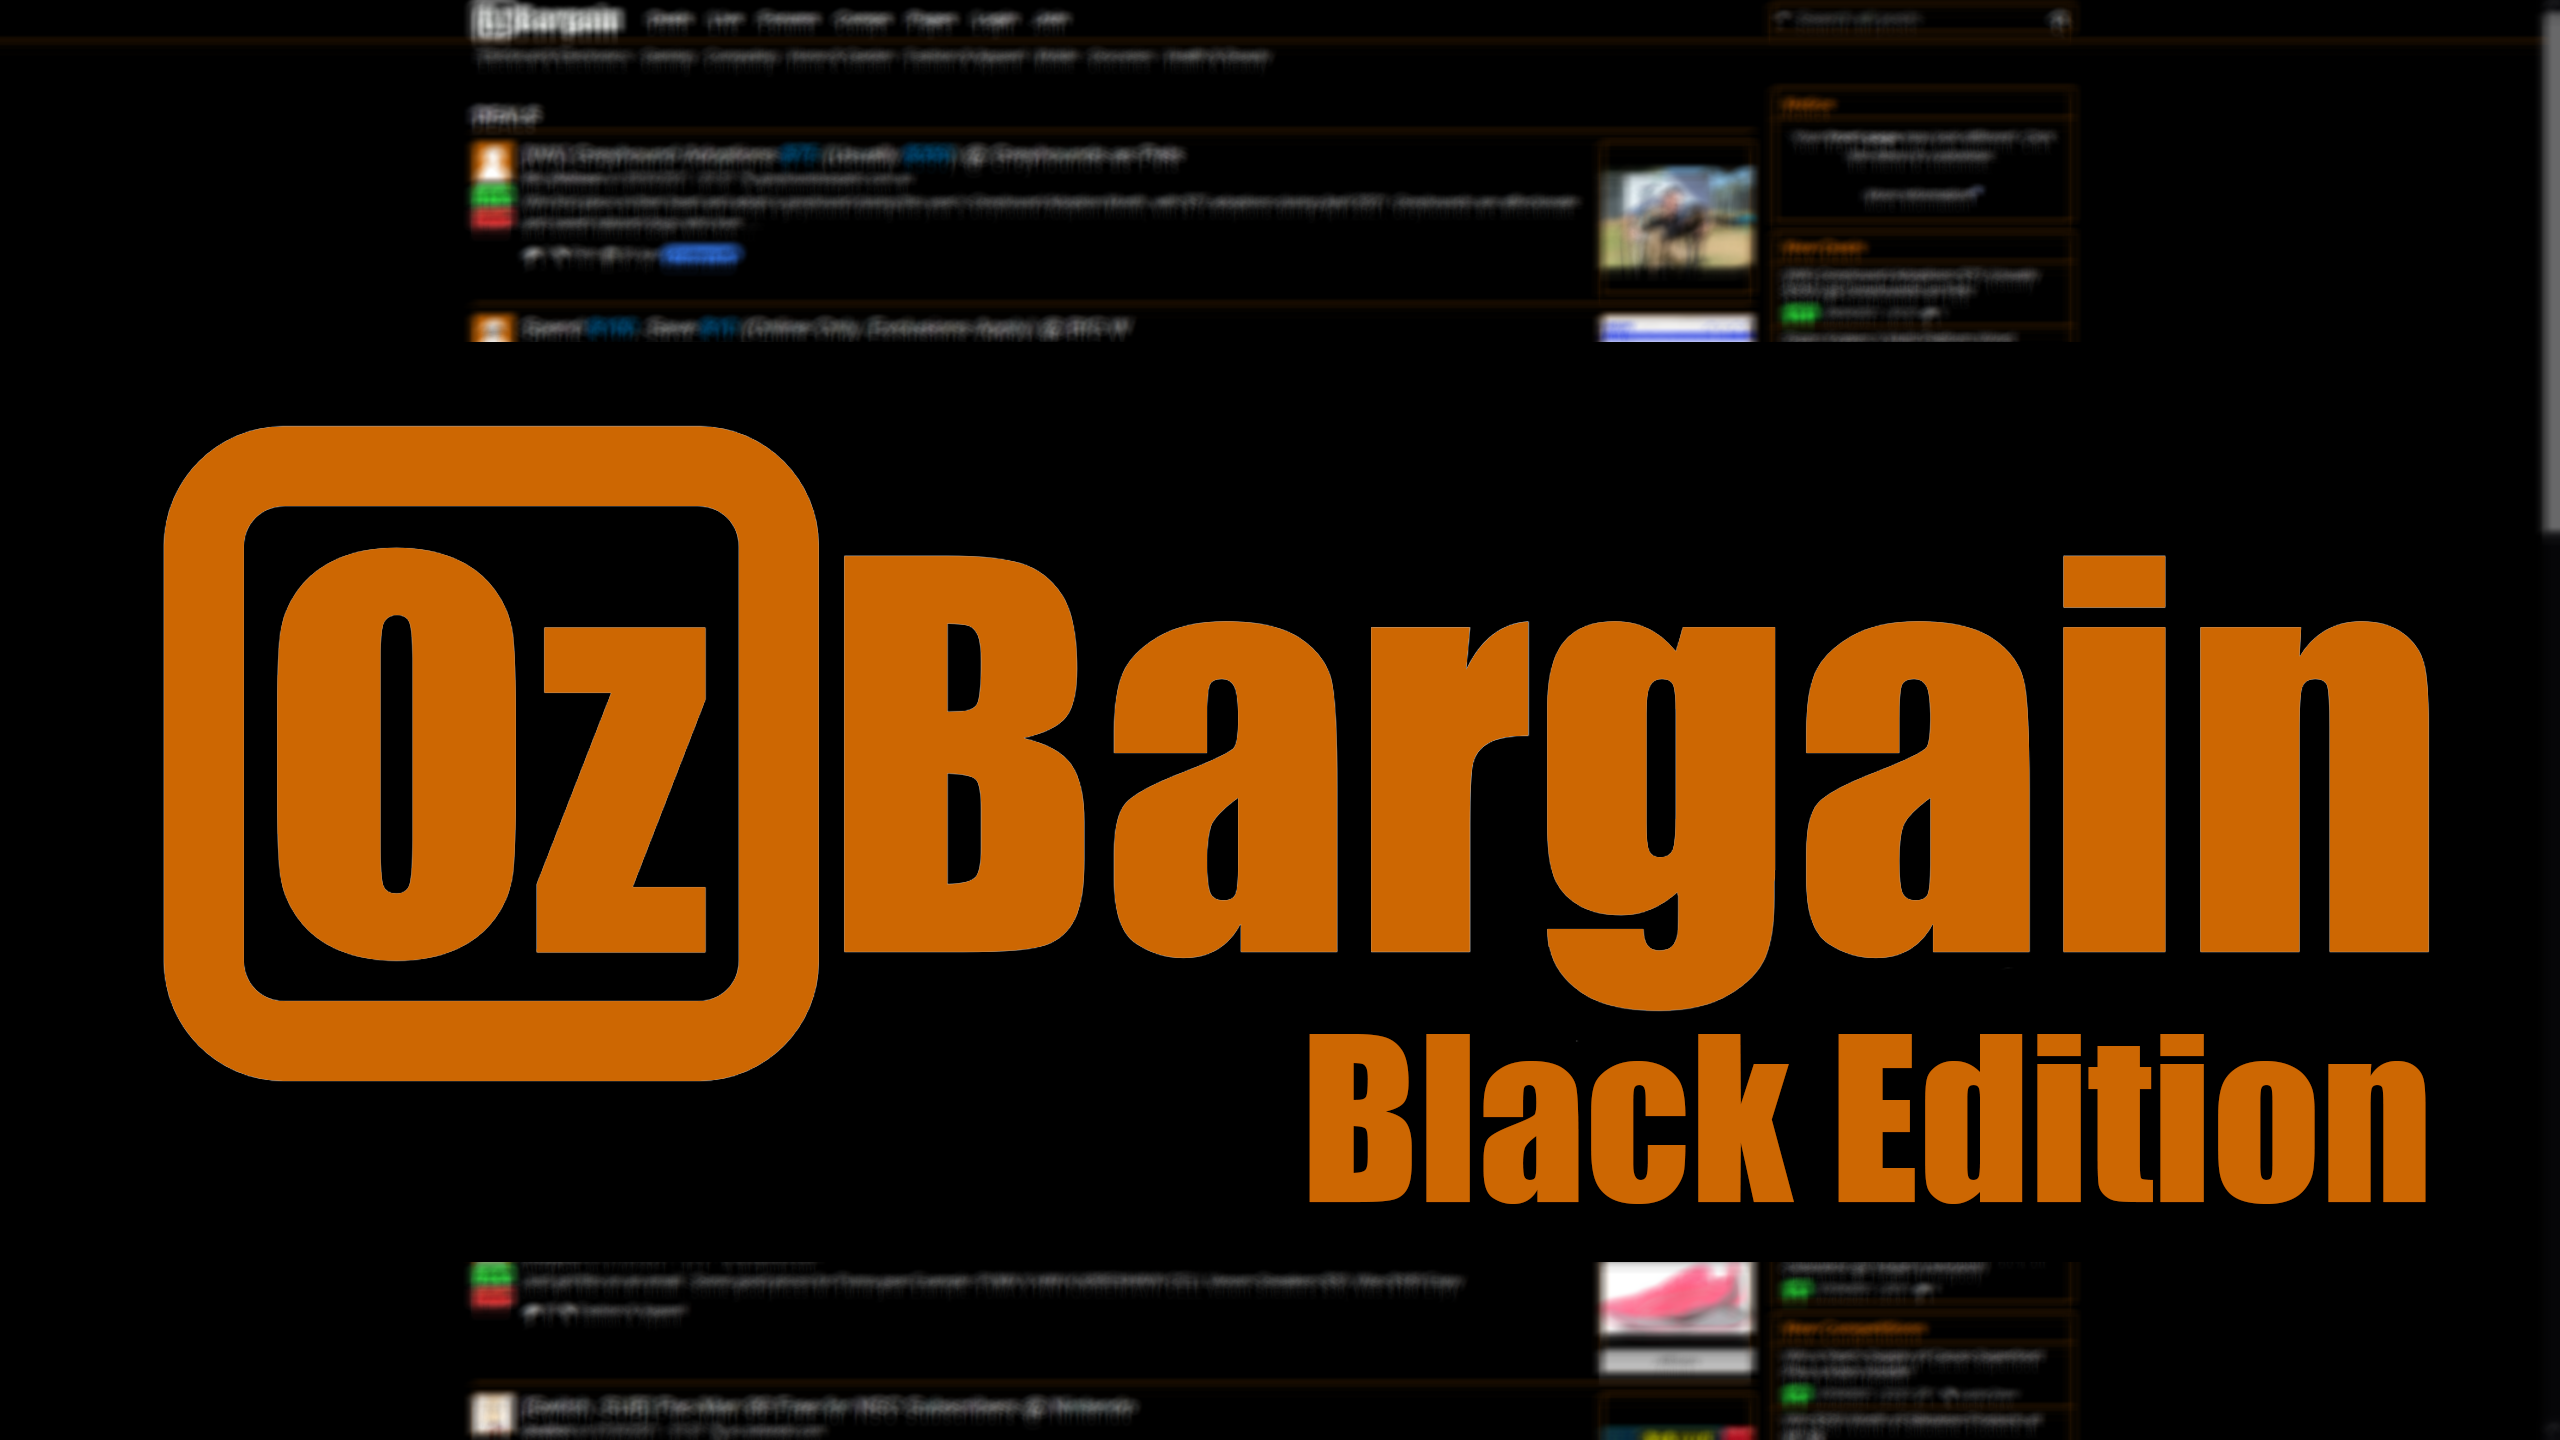 OzBargain Black Edition screenshot